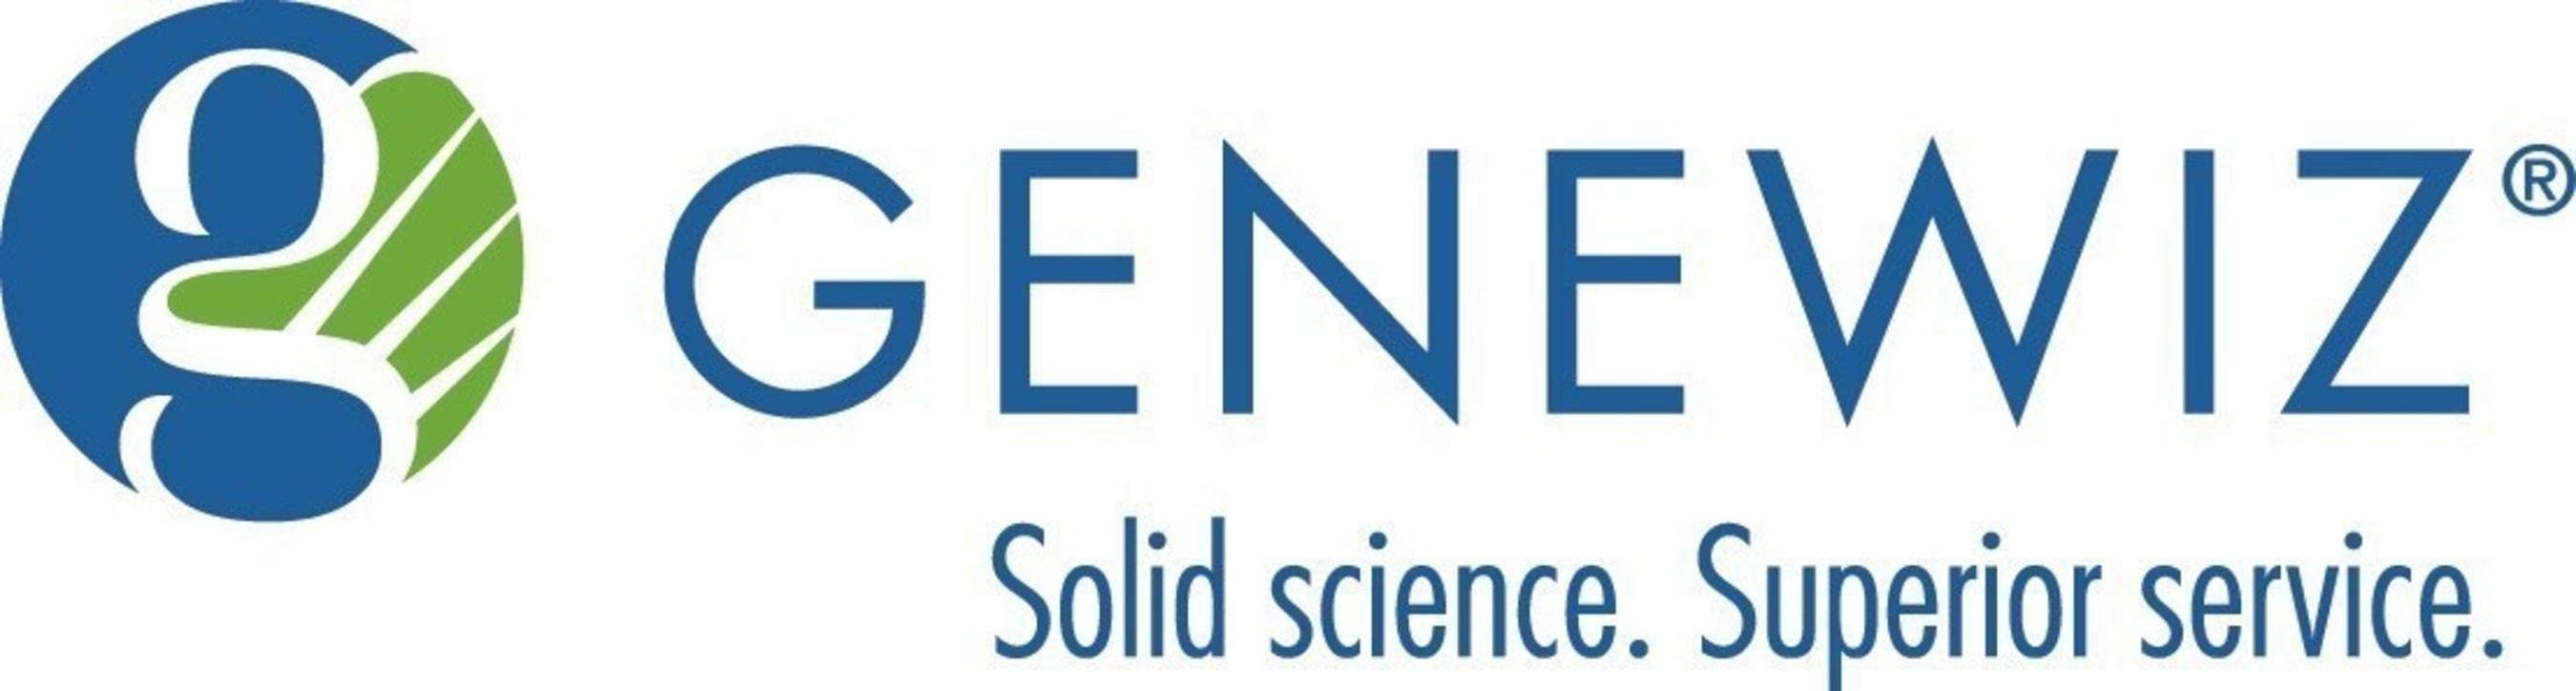 GENEWIZ to Present at PEGS Europe Protein & Antibody Summit